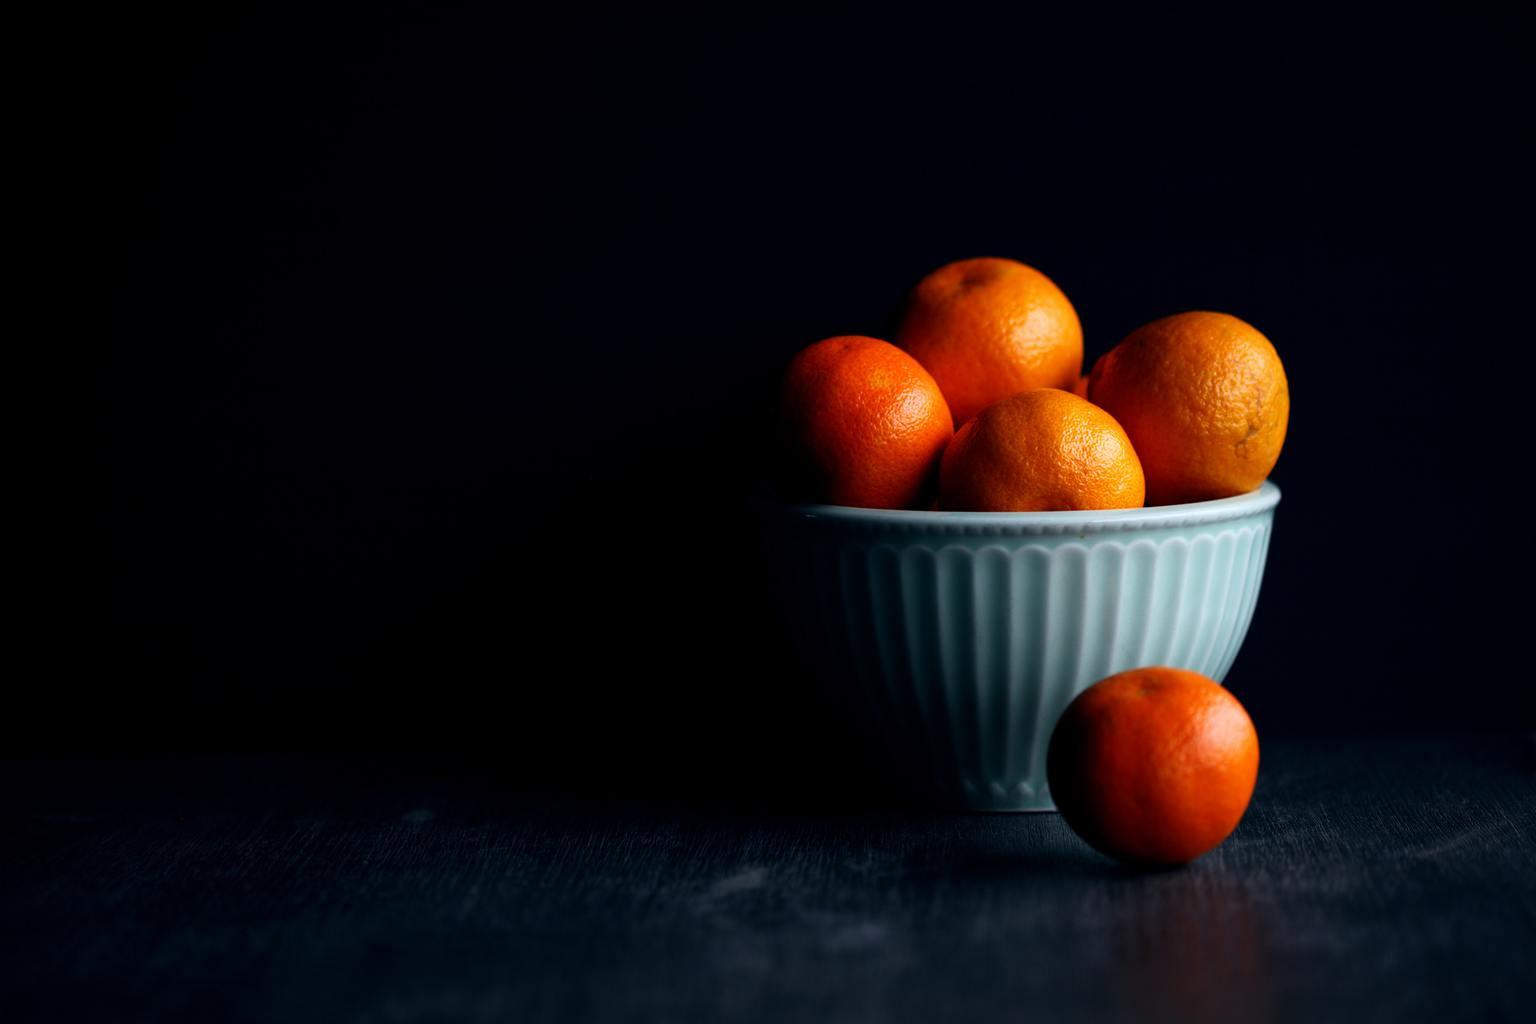 naranjas fondo oscuro naturaleza muerta